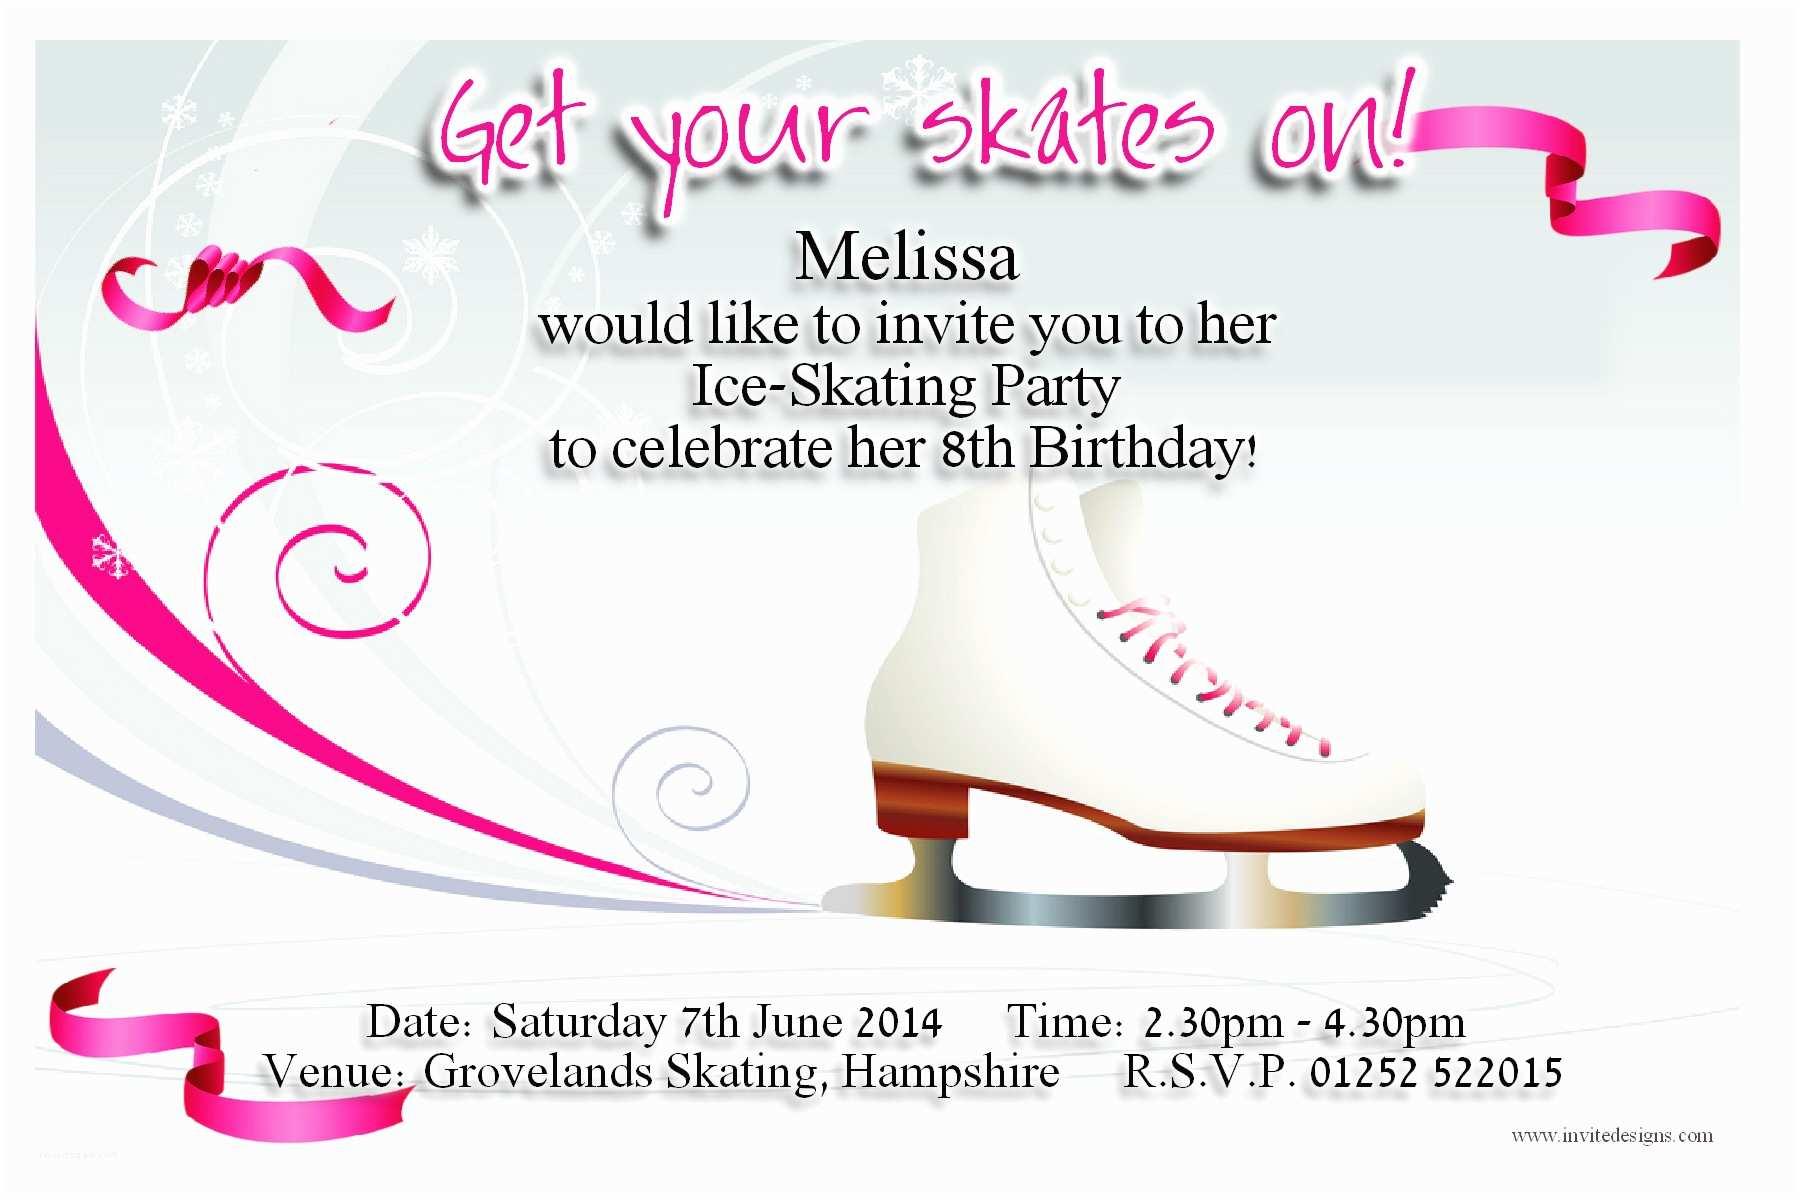 Ice Skating Party Invitations top 10 Ice Skating Birthday Party Invitations